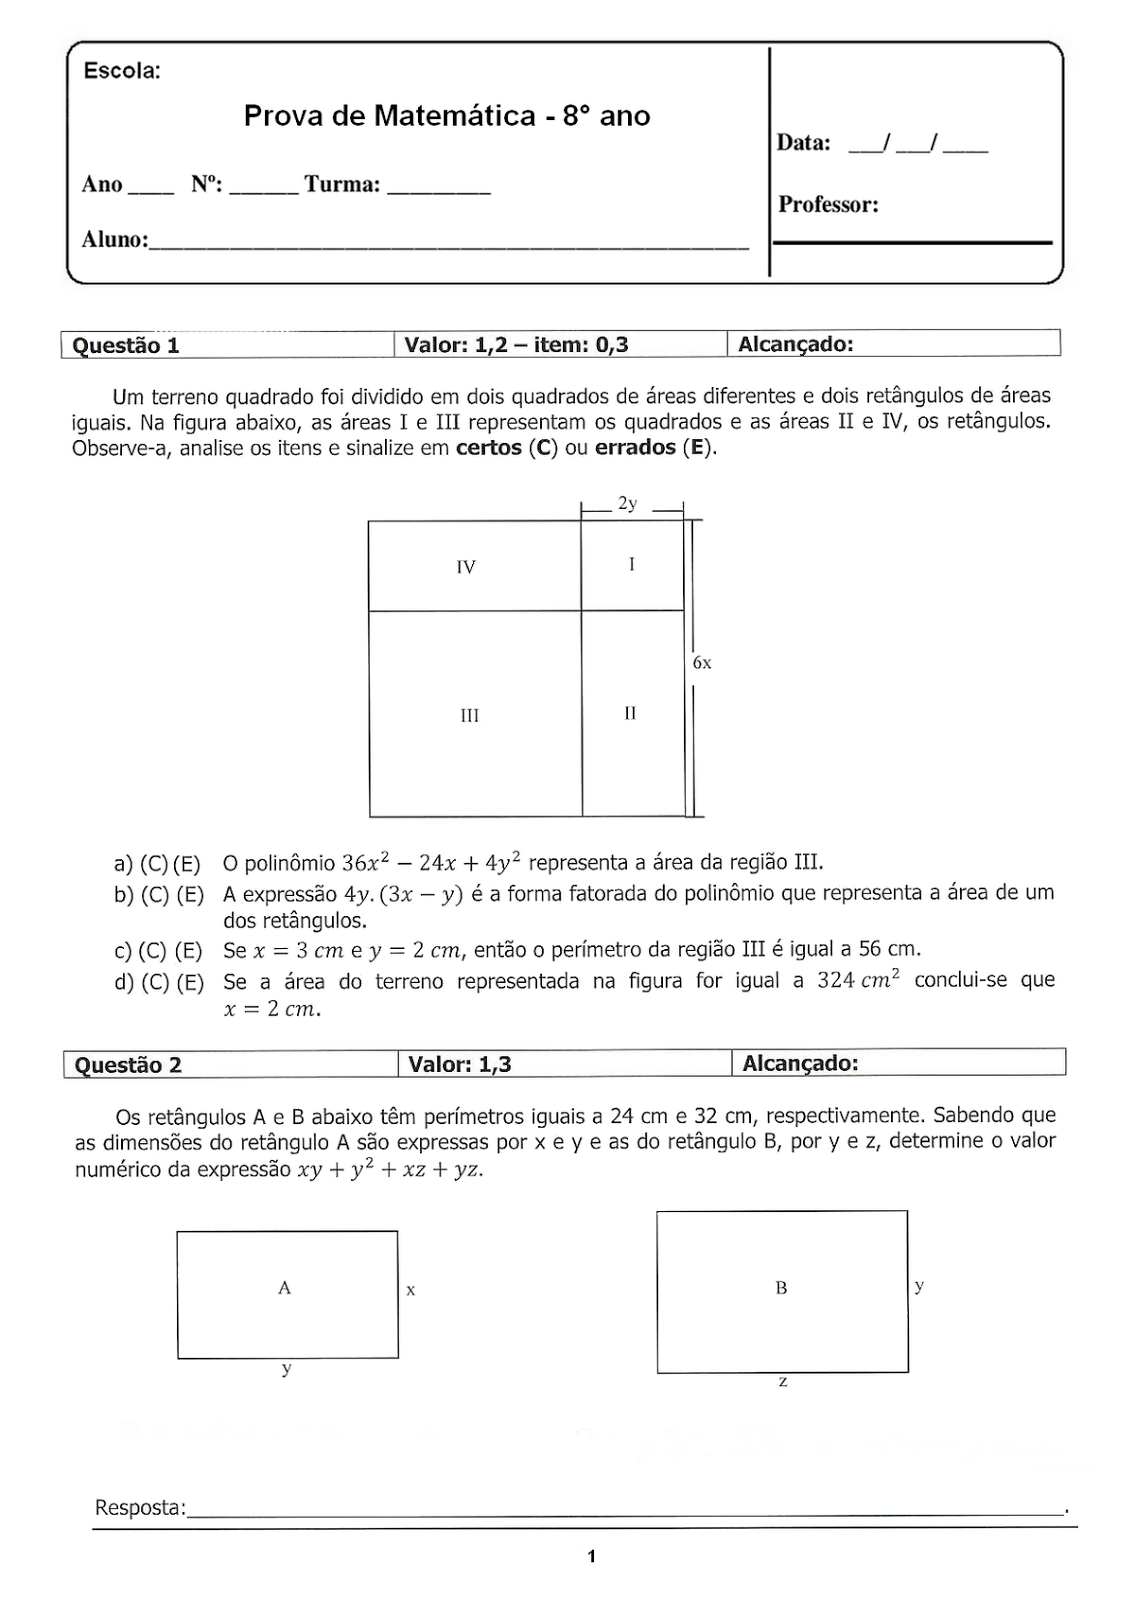 Portal Escola Matematica 8 Ano 190 Atividades Com Gabarito Exercicios Provas Avaliacoes Vi